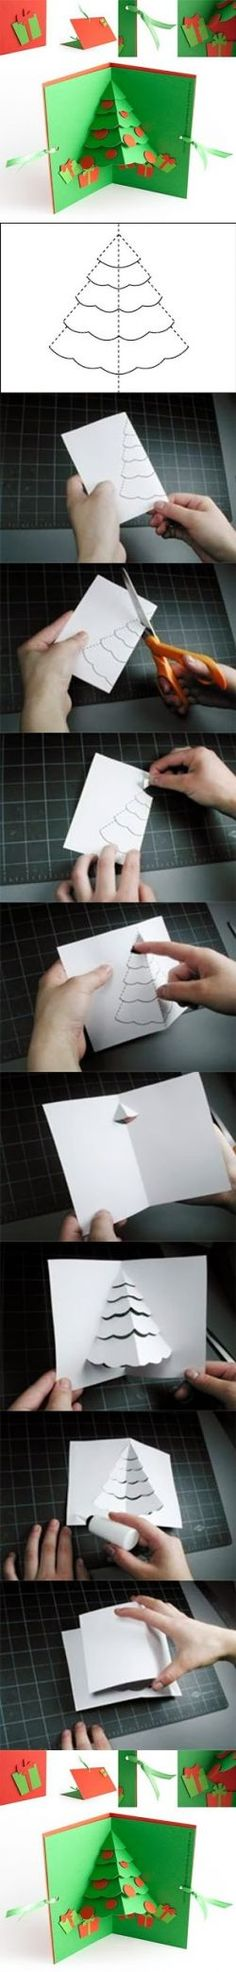 How to make a Christmas Tree Card